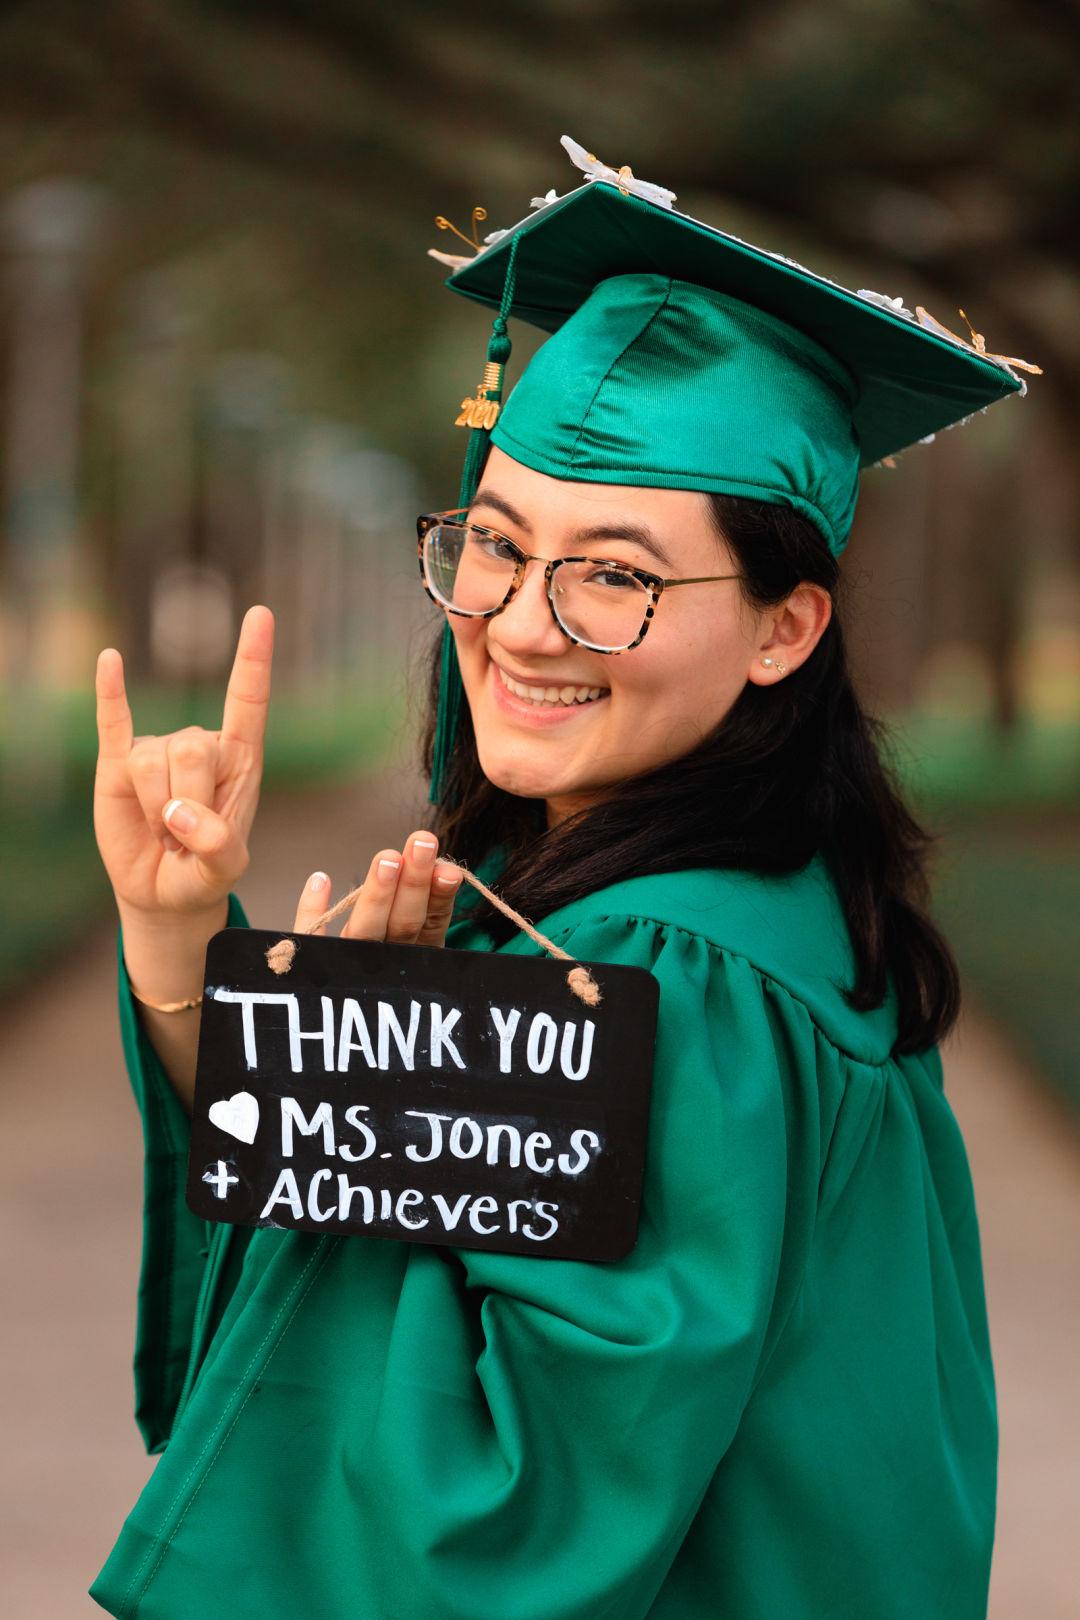 Achievers program alumna and current University of South Florida student Sofia Salazar